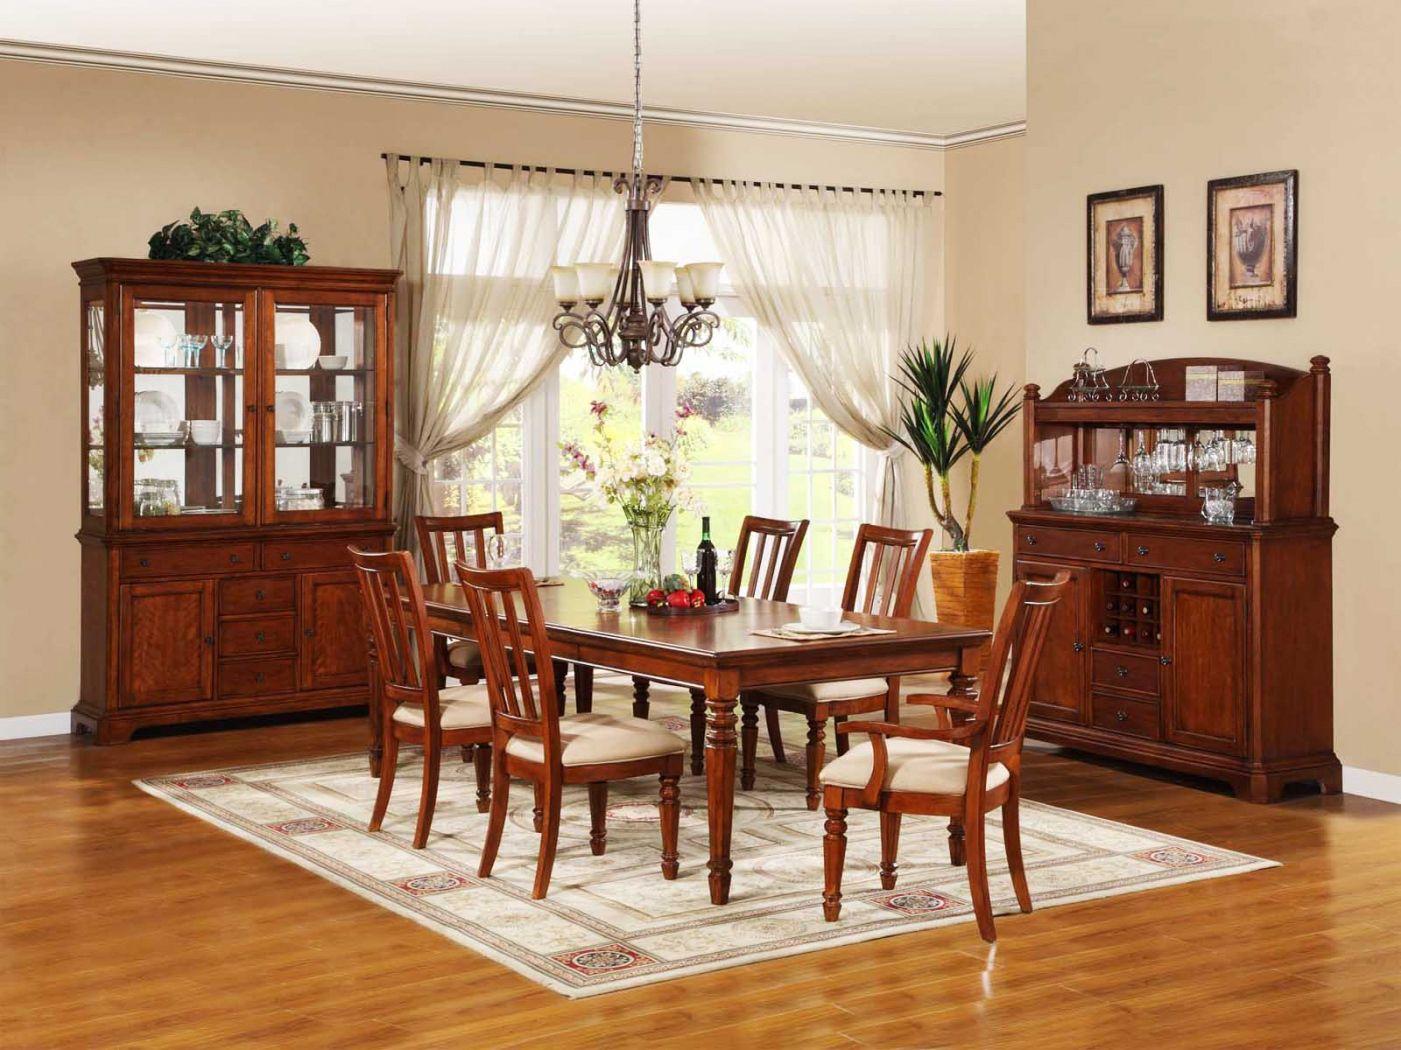 30 Kathy Ireland Baby Furniture - Master Bedroom Interior ...